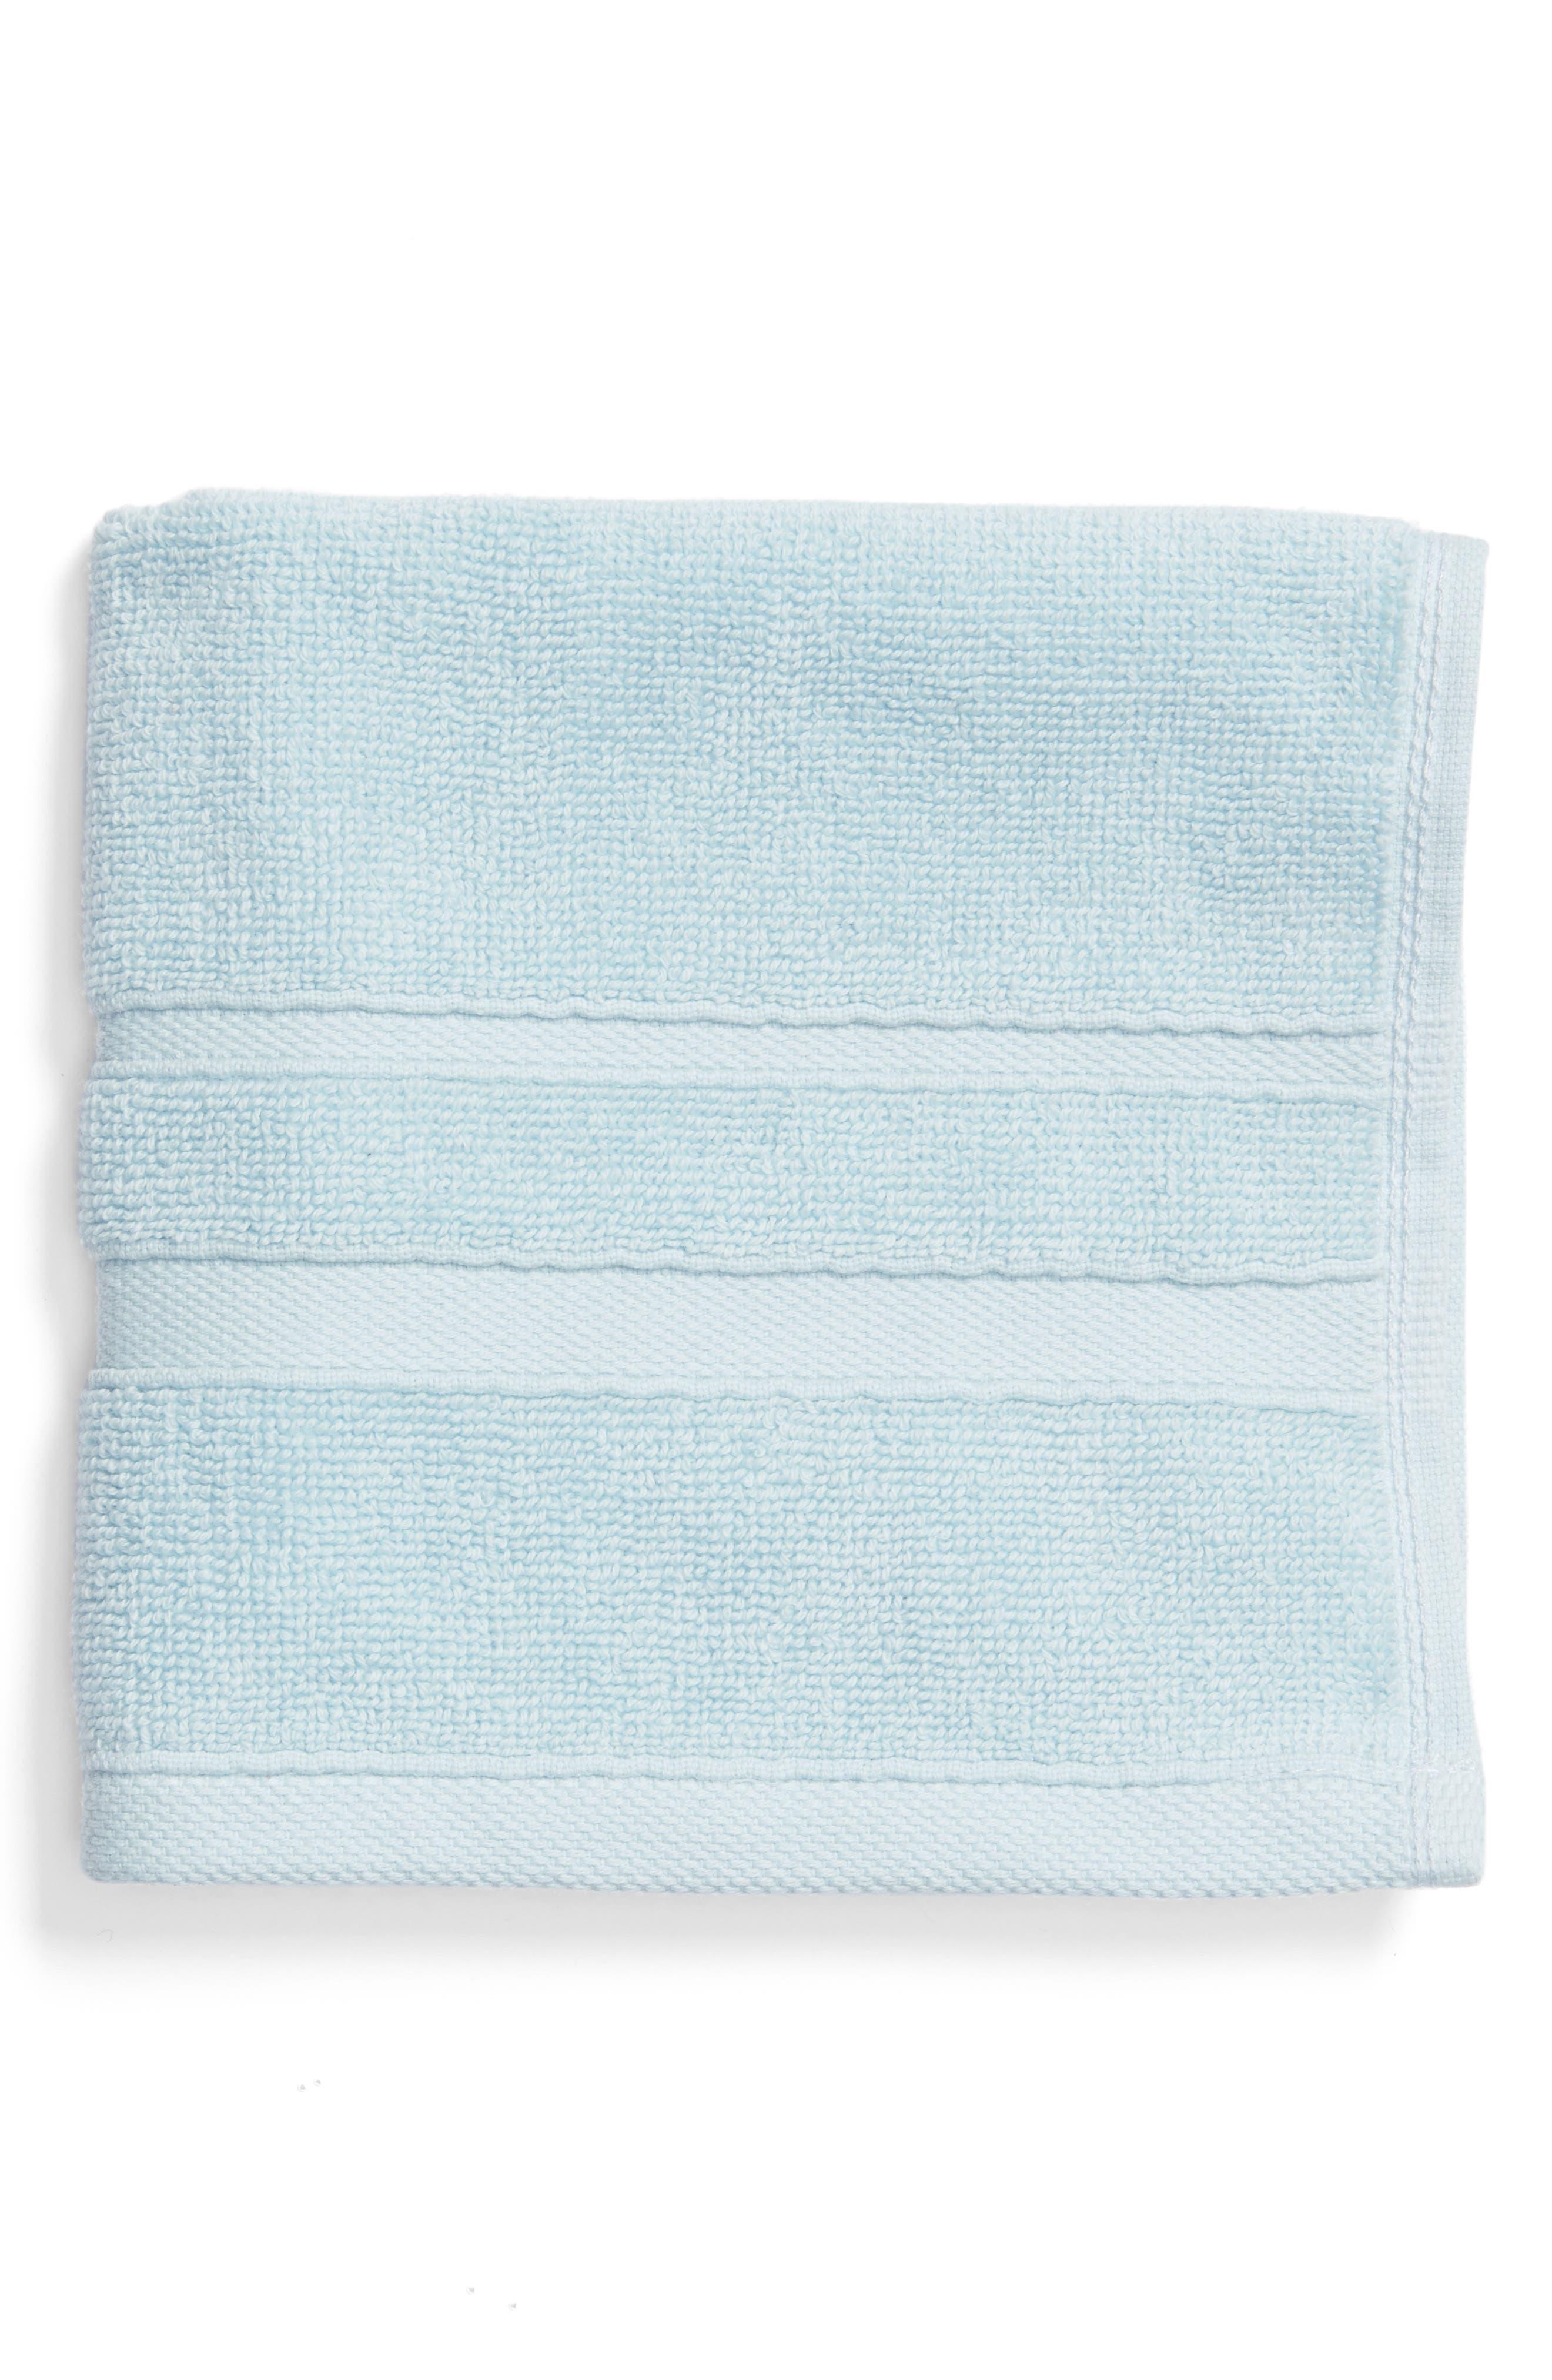 WATERWORKS STUDIO 'Perennial' Combed Turkish Cotton Washcloth, Main, color, CHRYSTAL BLUE